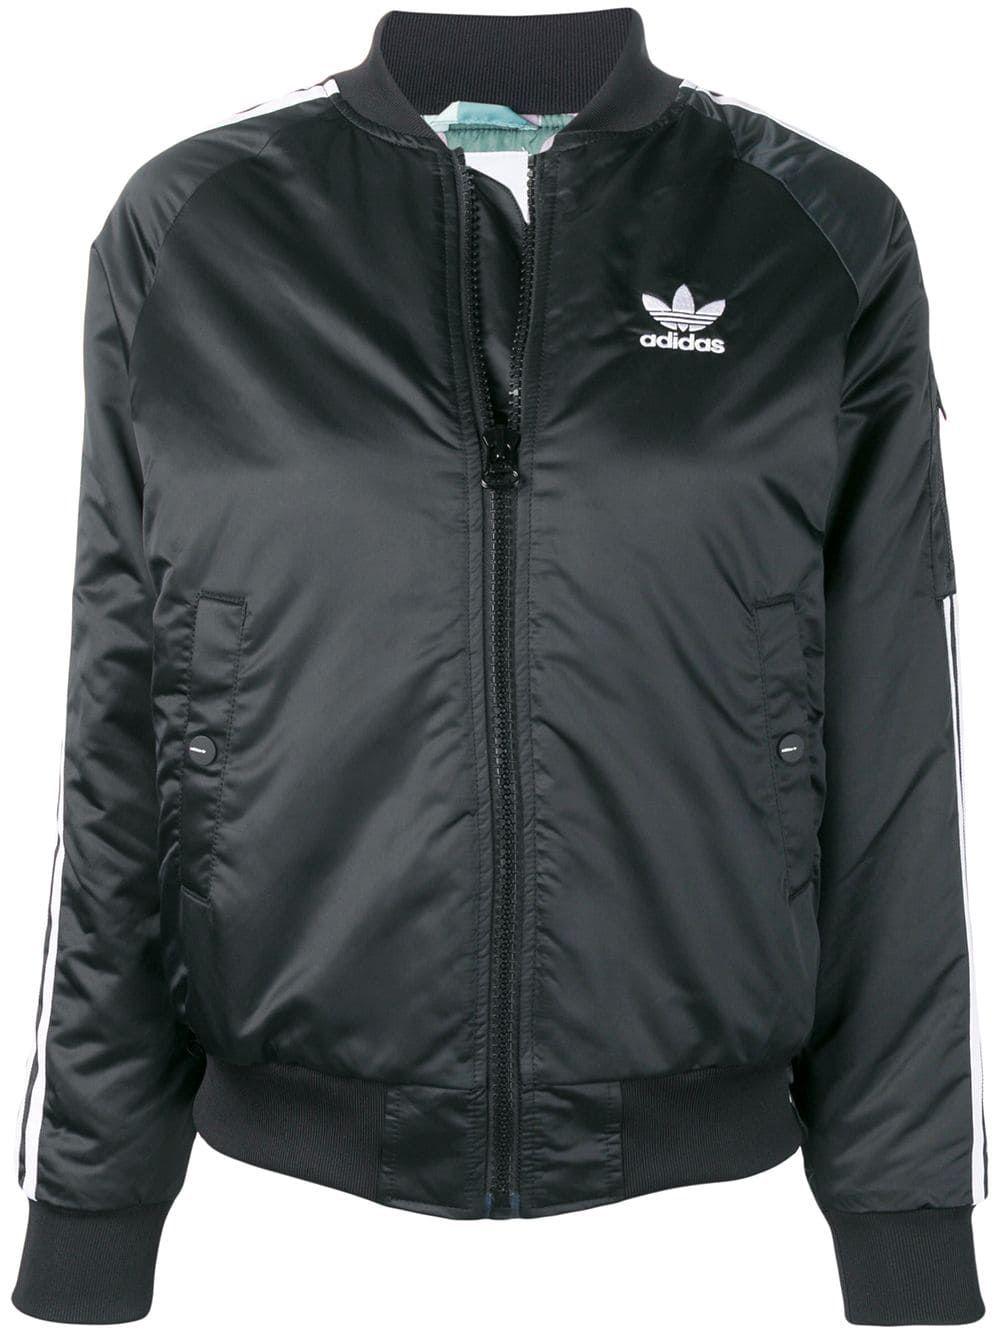 Adidas Adidas Originals bomber jacket Black | Adidas